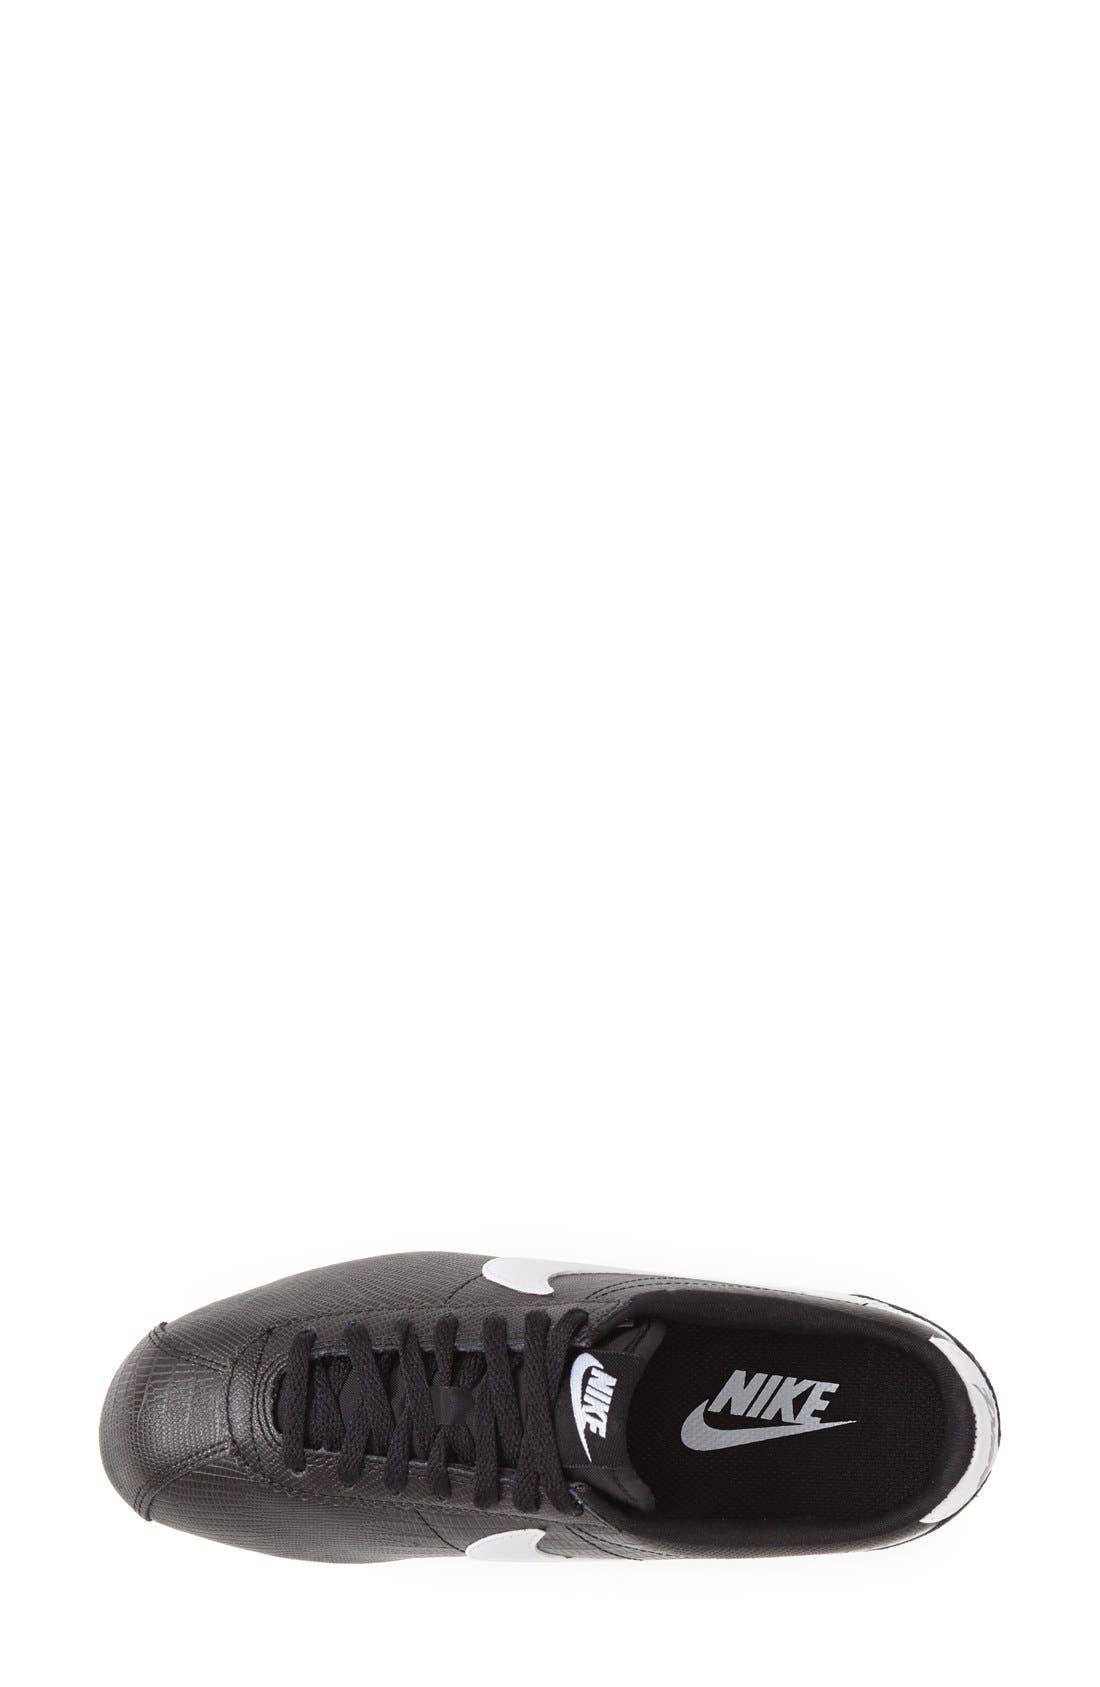 Alternate Image 3  - Nike 'Classic Cortez' Leather Sneaker (Women)